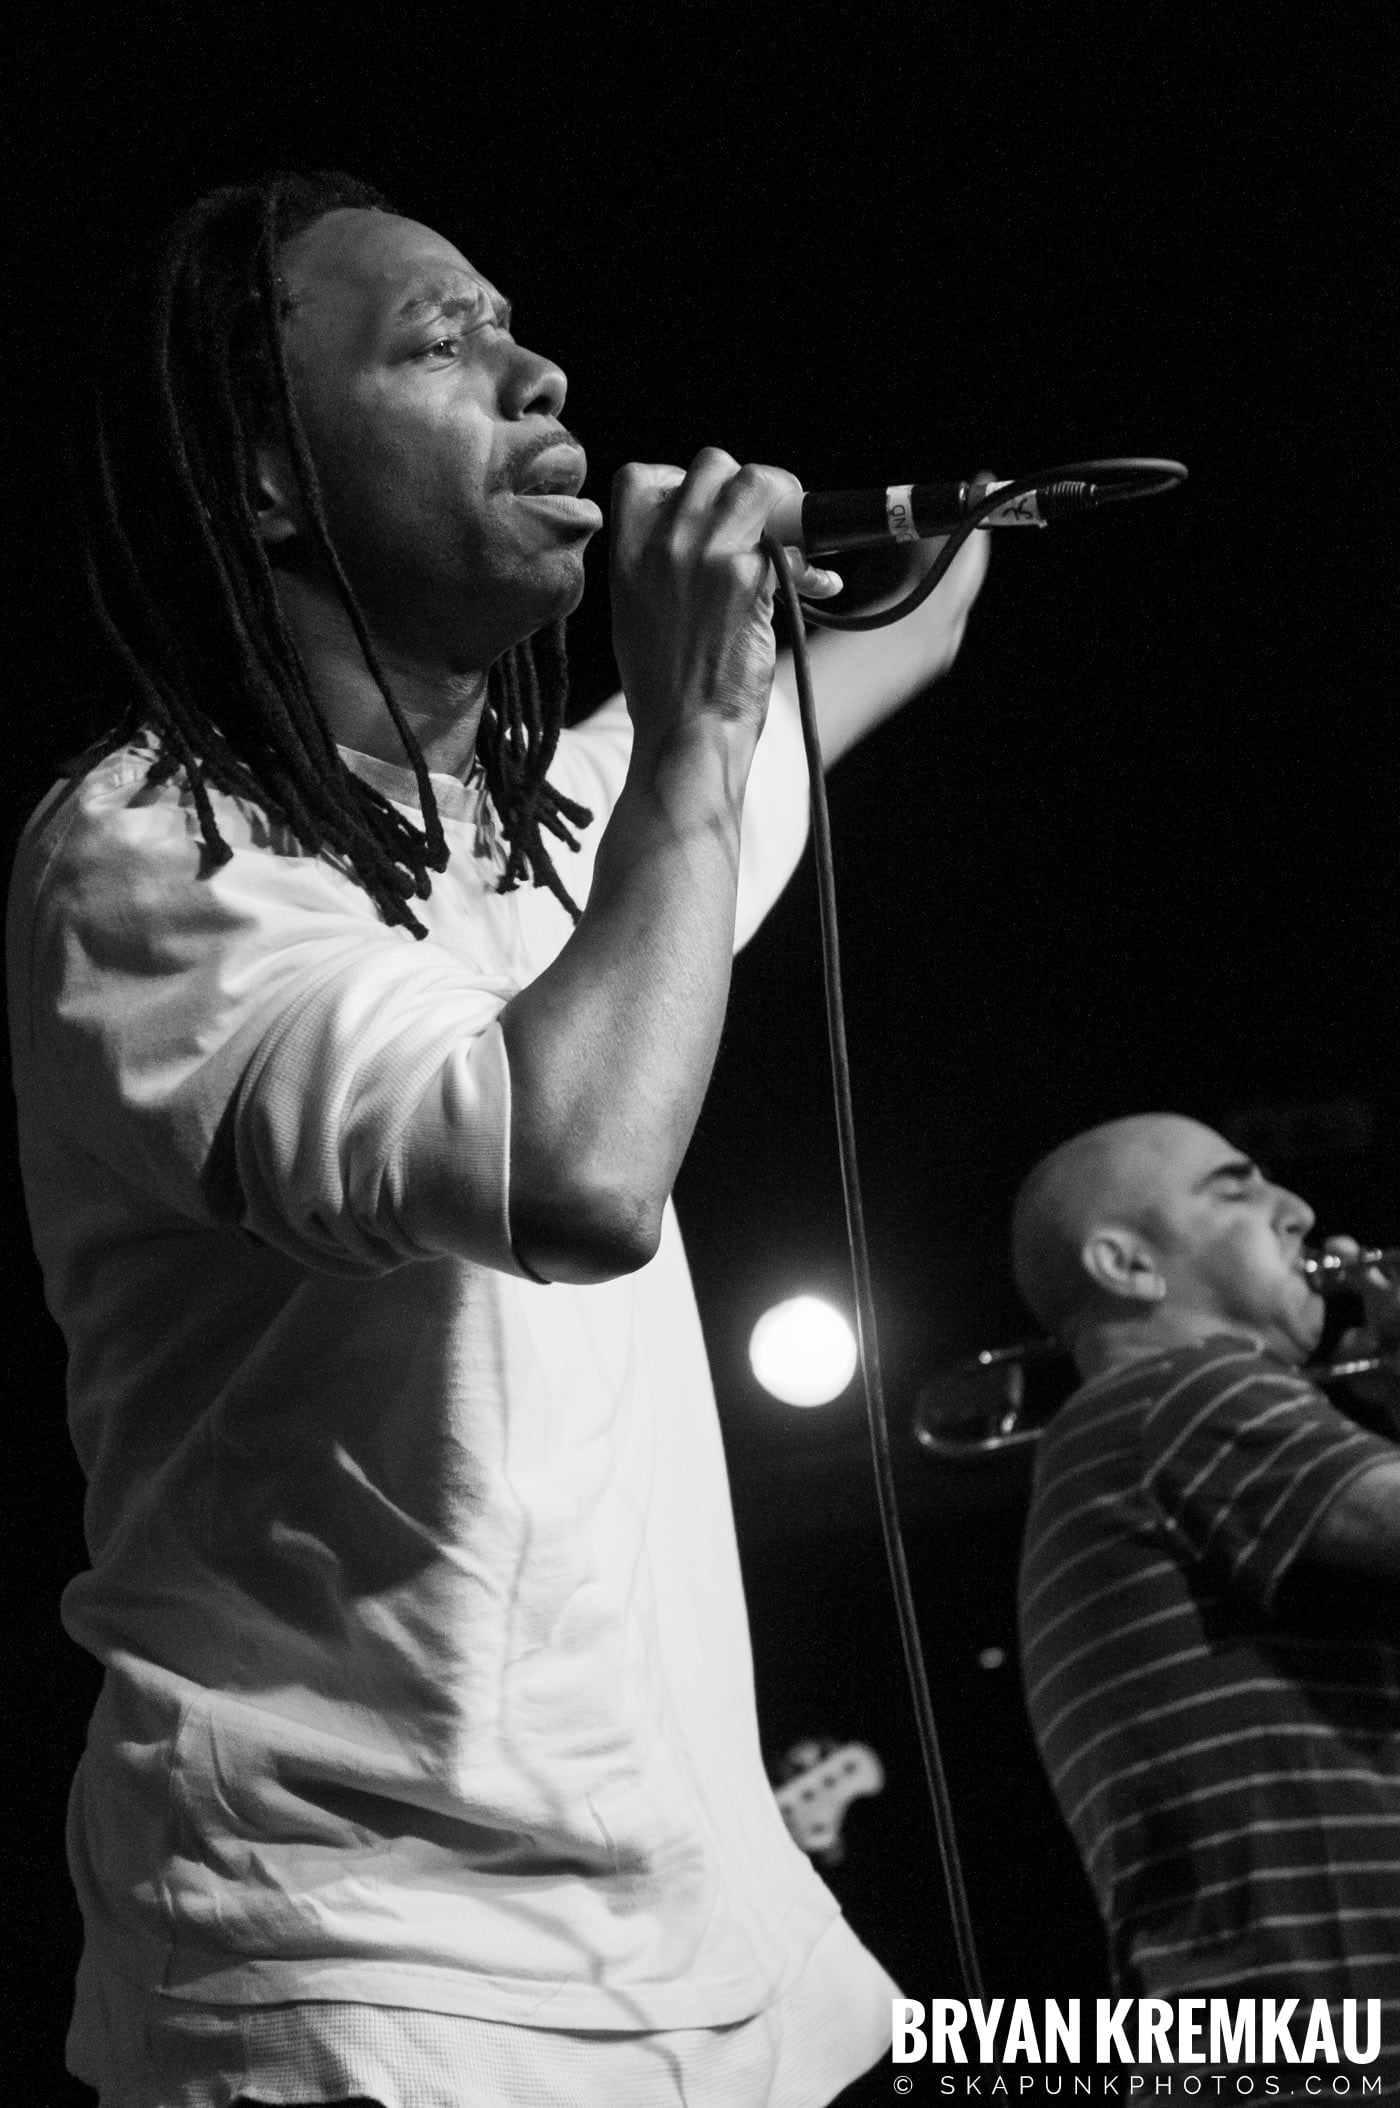 Pilfers (Ska is Dead Tour) @ Starland Ballroom, Sayreville, NJ - 11.15.09 (28)